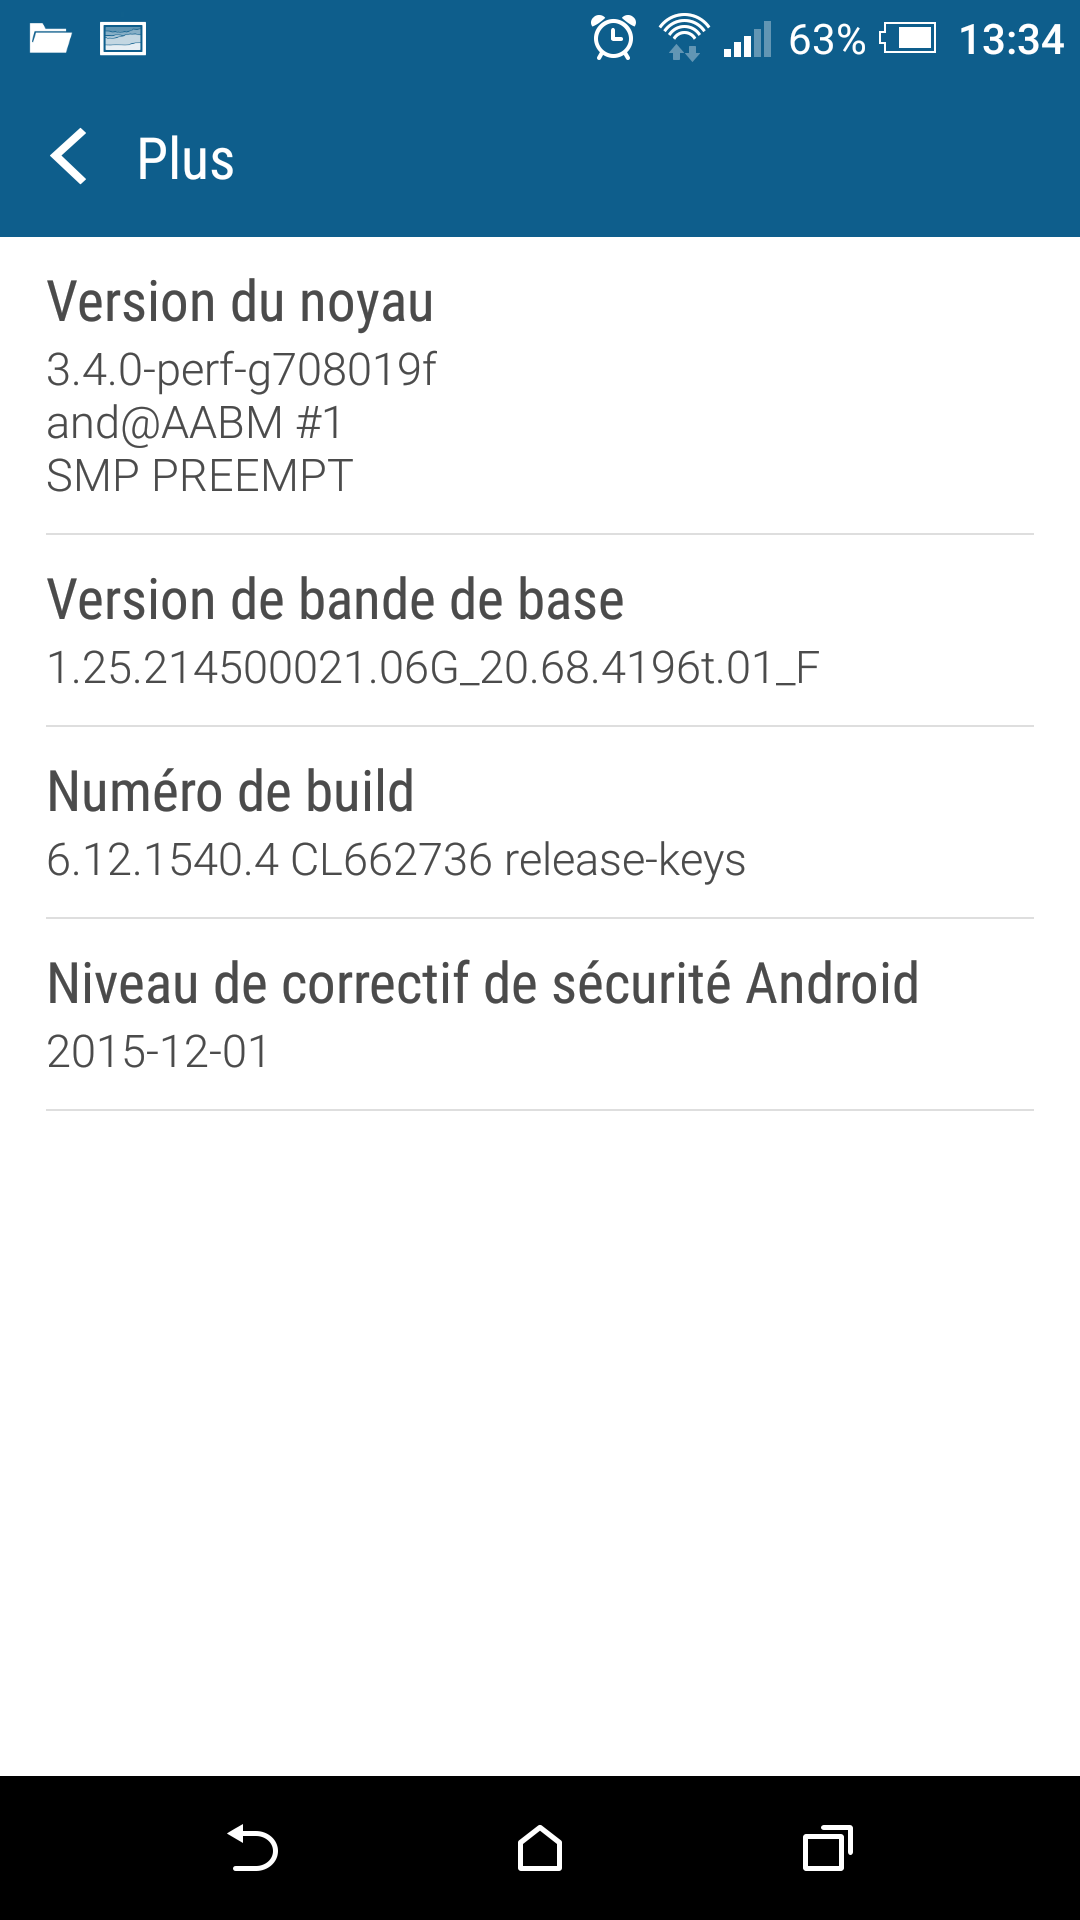 [ROM HTC ONE M8] MARSHMALLOW SENSE 7 | Android Revolution HD 53.1 | ART | 6.12.401.48R [29/01/2016]  - Page 15 140231Screenshot20160109133410